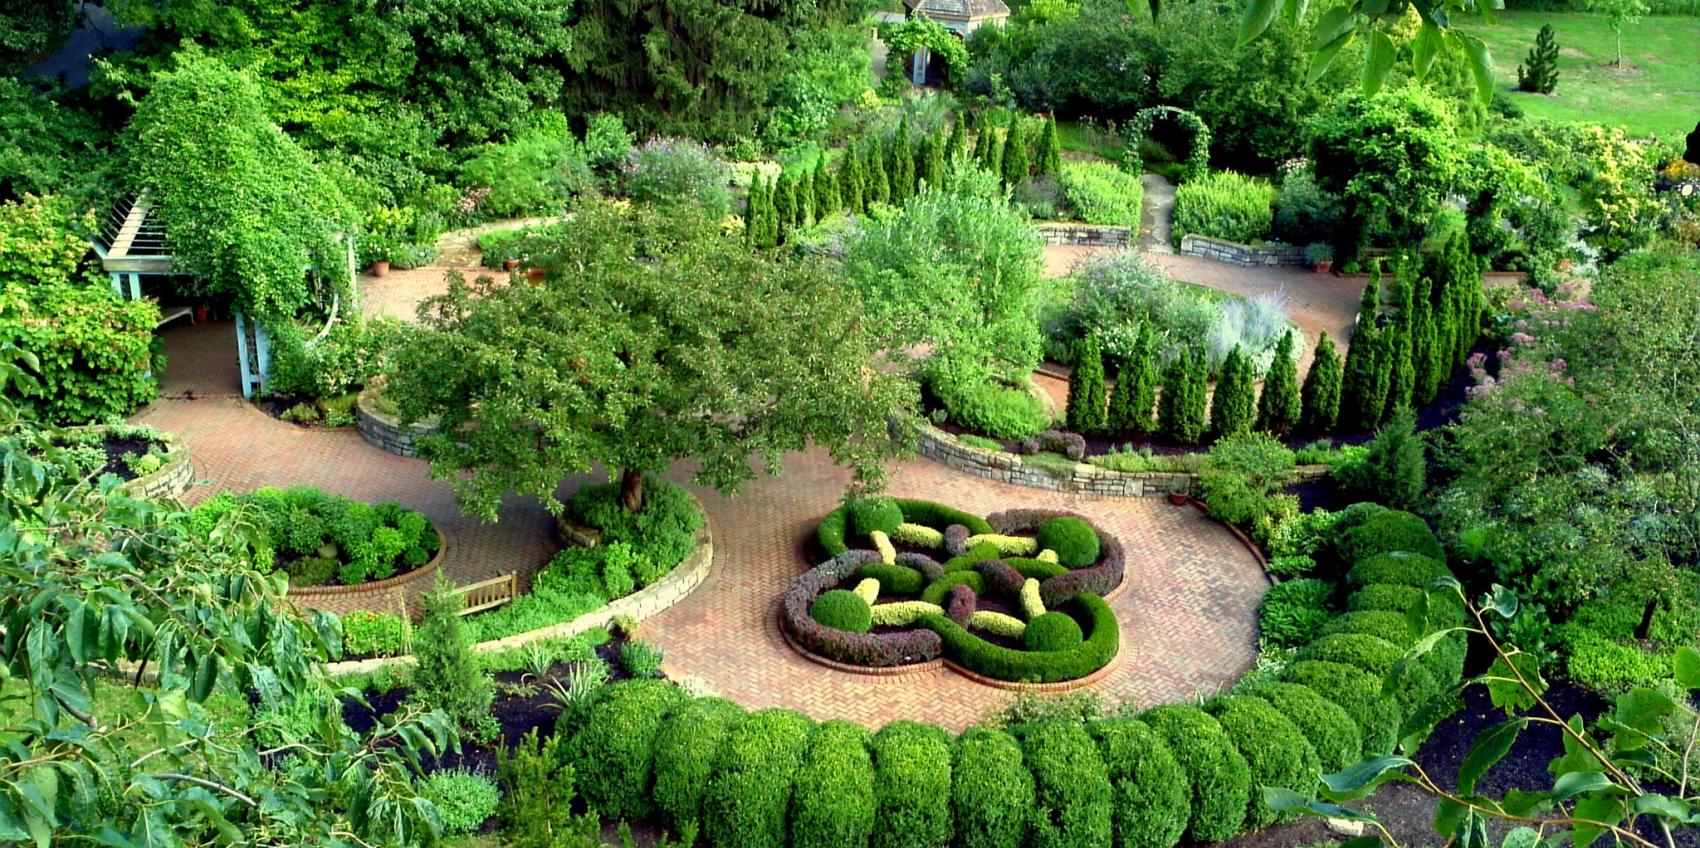 Inniswood metro gardens american public gardens association for American garden association